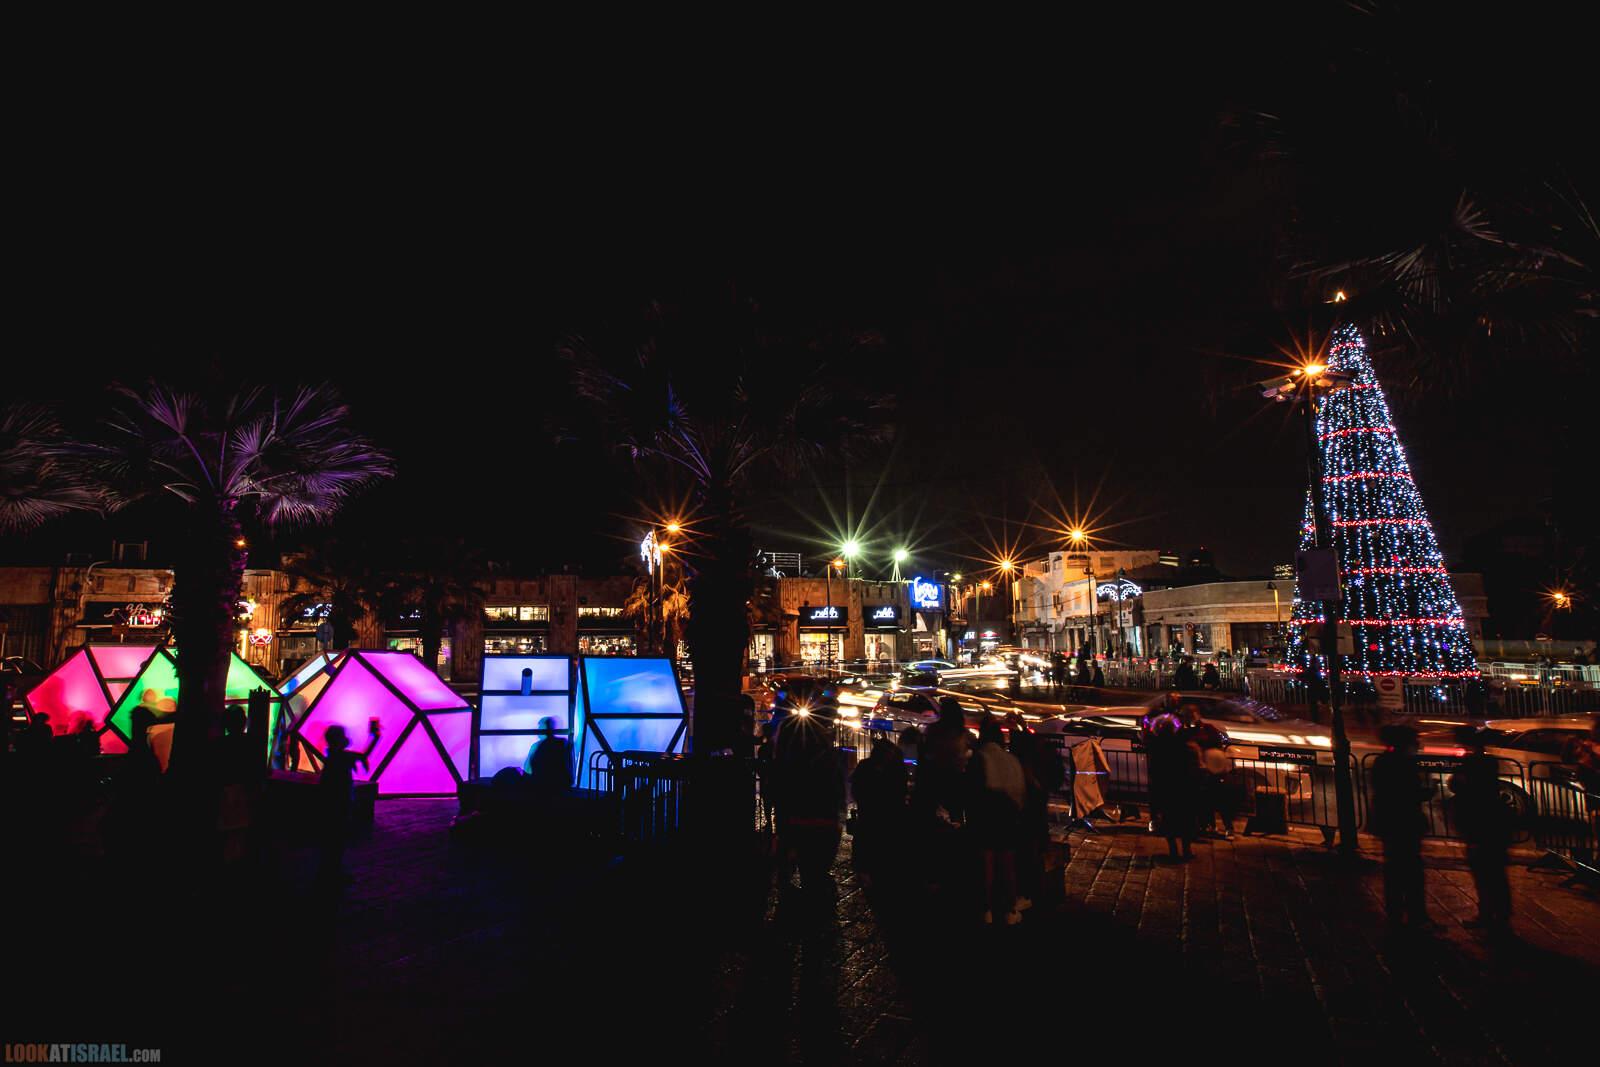 Рождественская ёлка в Яффо 2020 | LookAtIsrael.com - Фото путешествия по Израилю